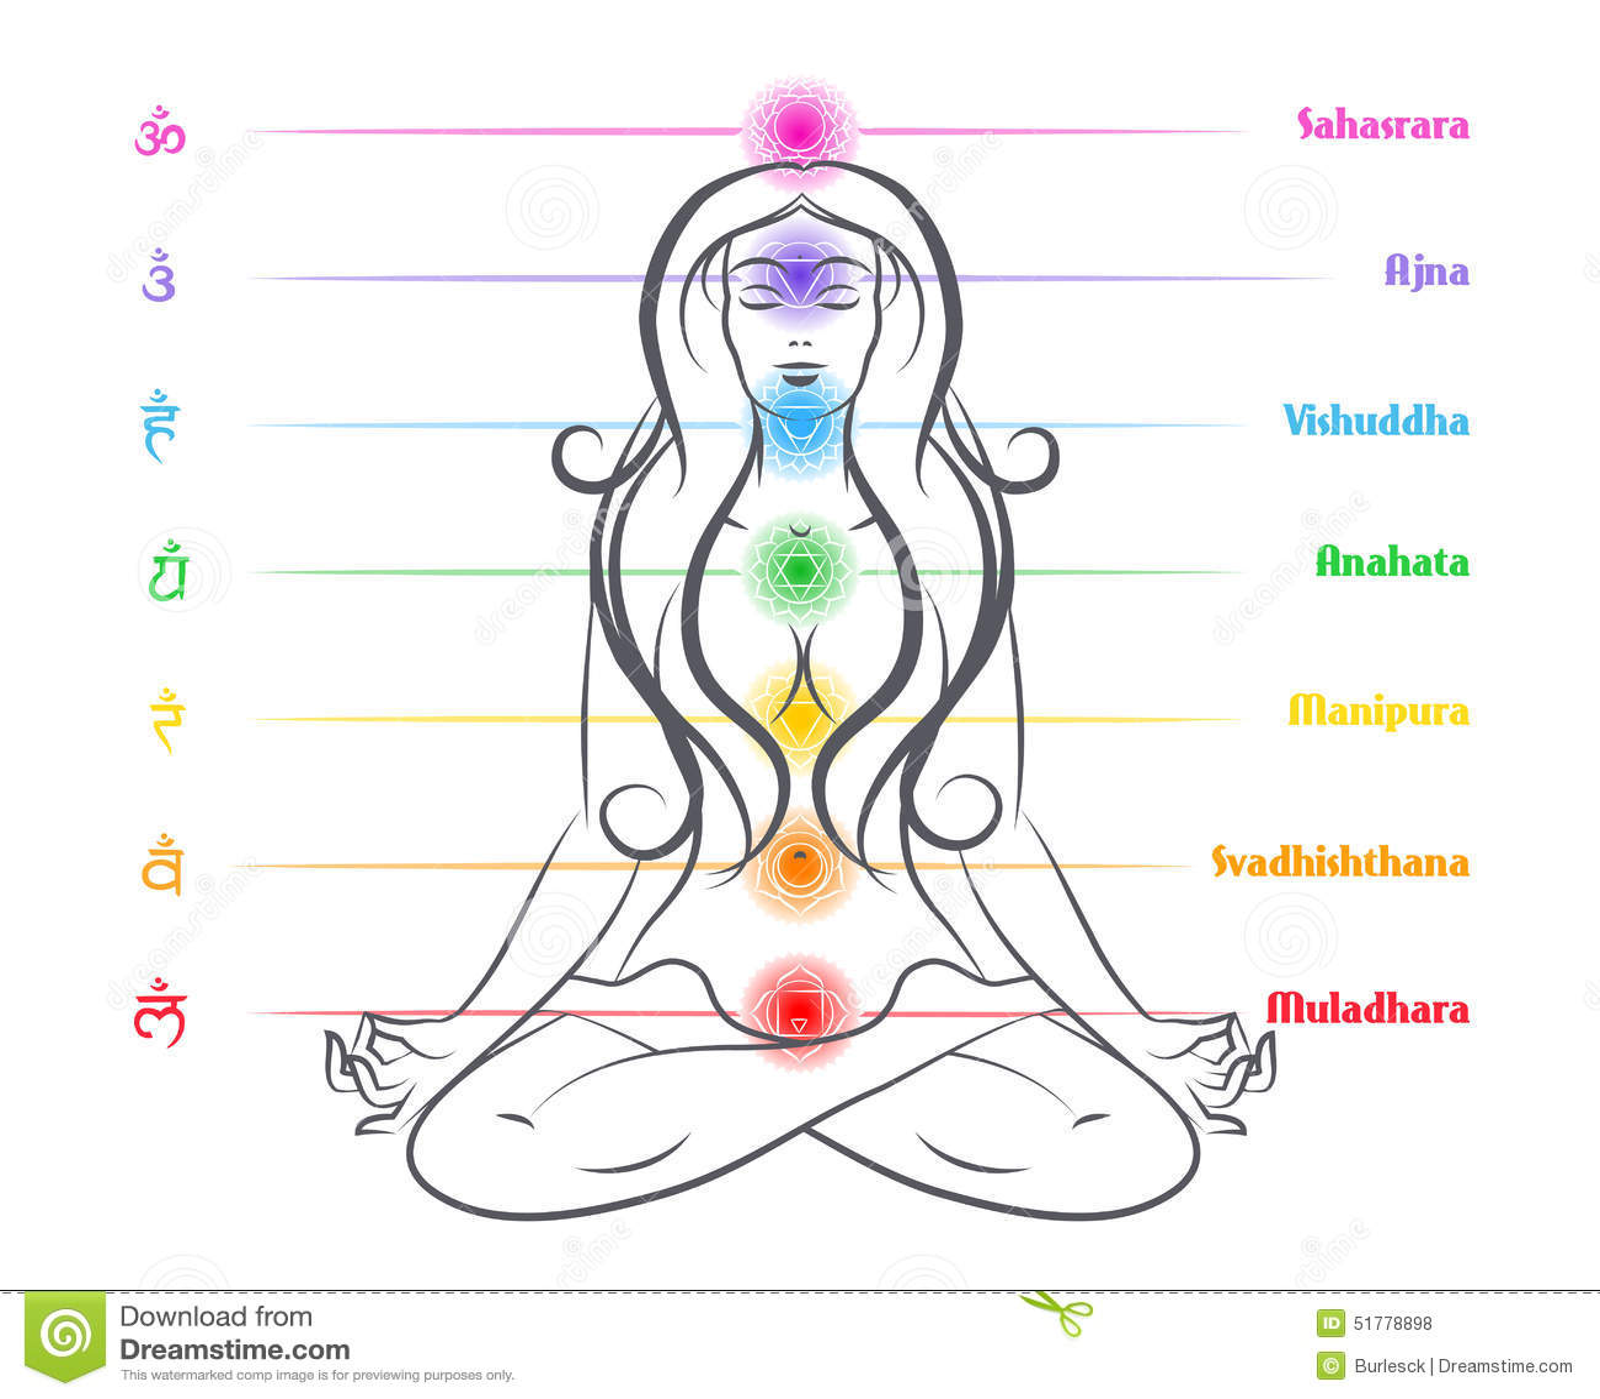 Tantra el yoga del amor online dating 1